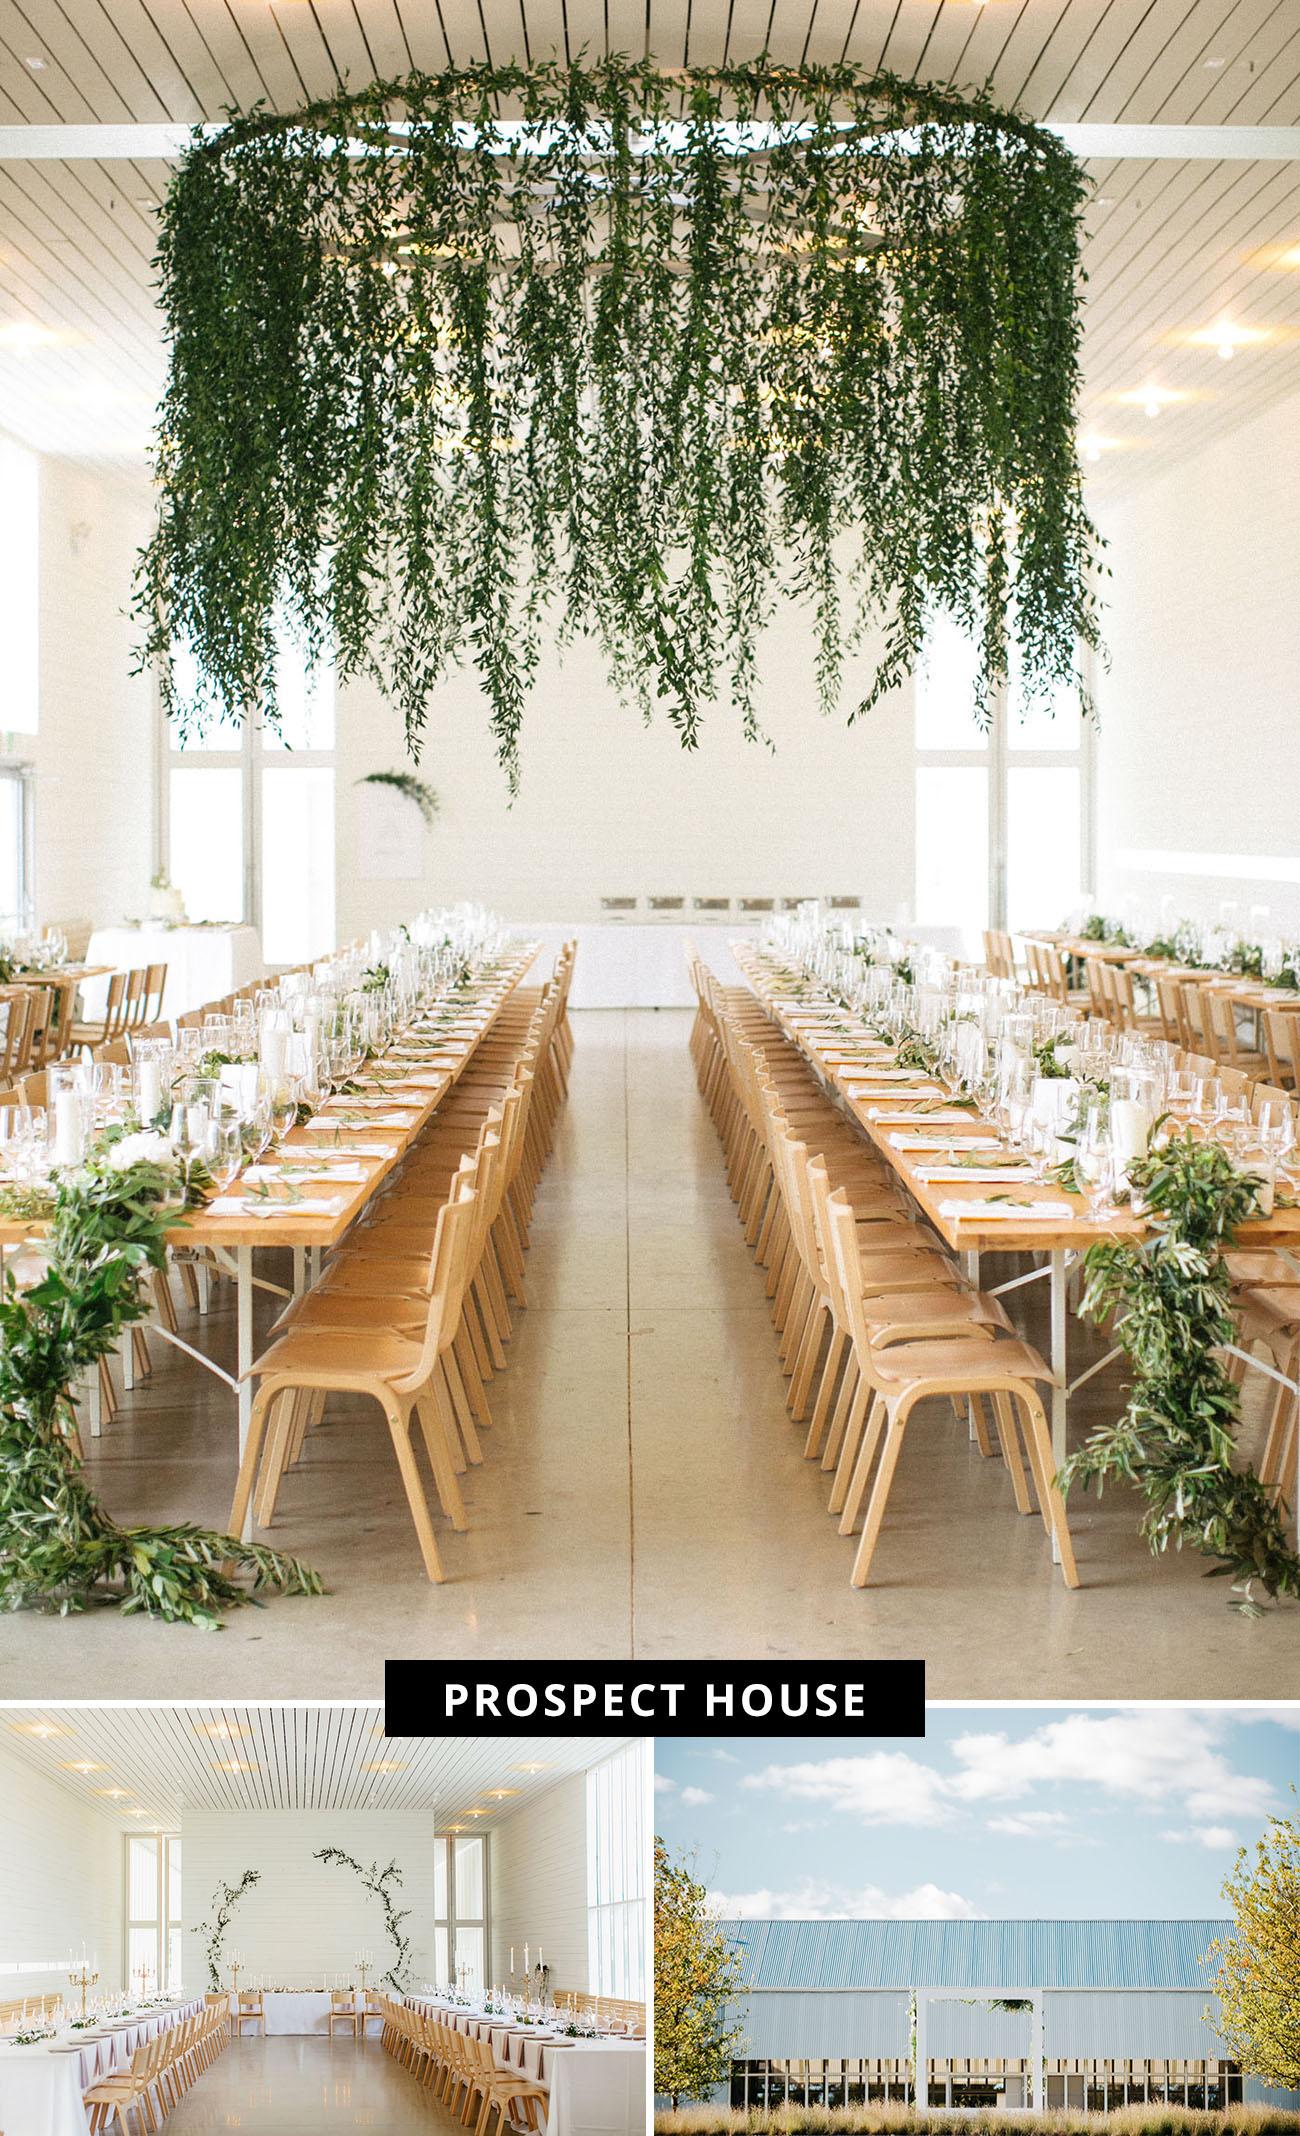 Prospect House modern barn wedding venue